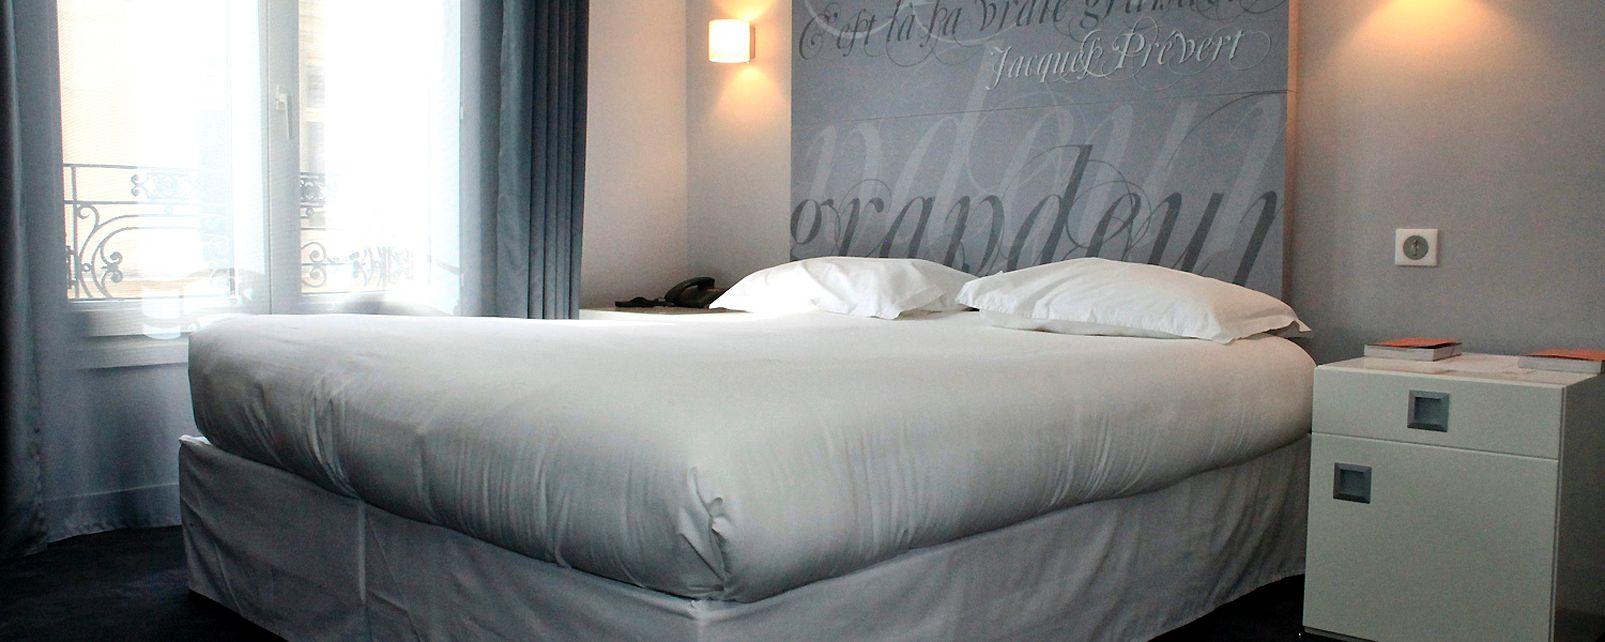 h tel chambellan morgane hotel paris france. Black Bedroom Furniture Sets. Home Design Ideas